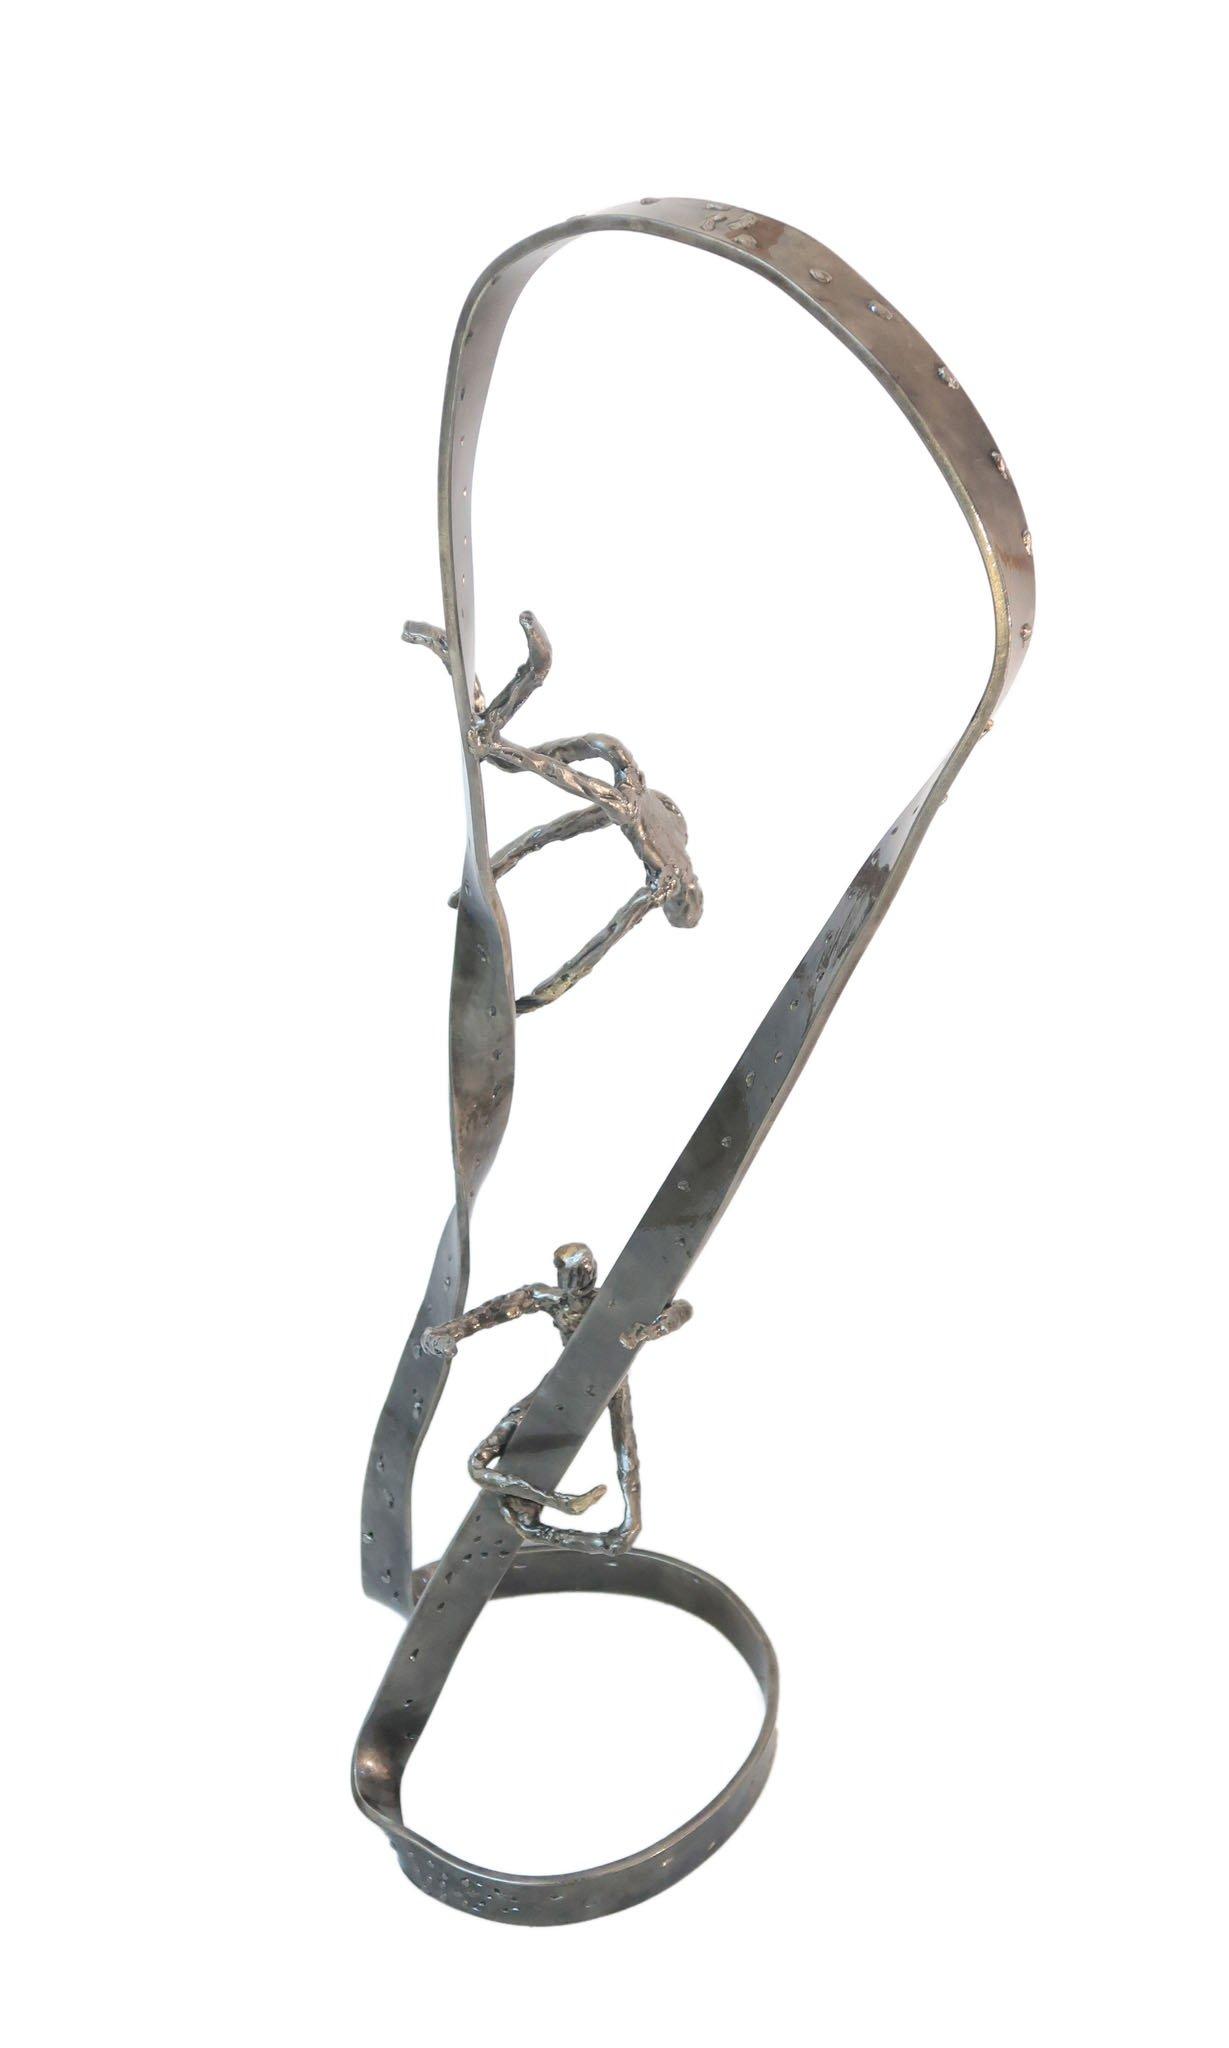 'In my head I'   2018   Iron & brass sculpture of the Israeli artist, sculptor Rami Ater